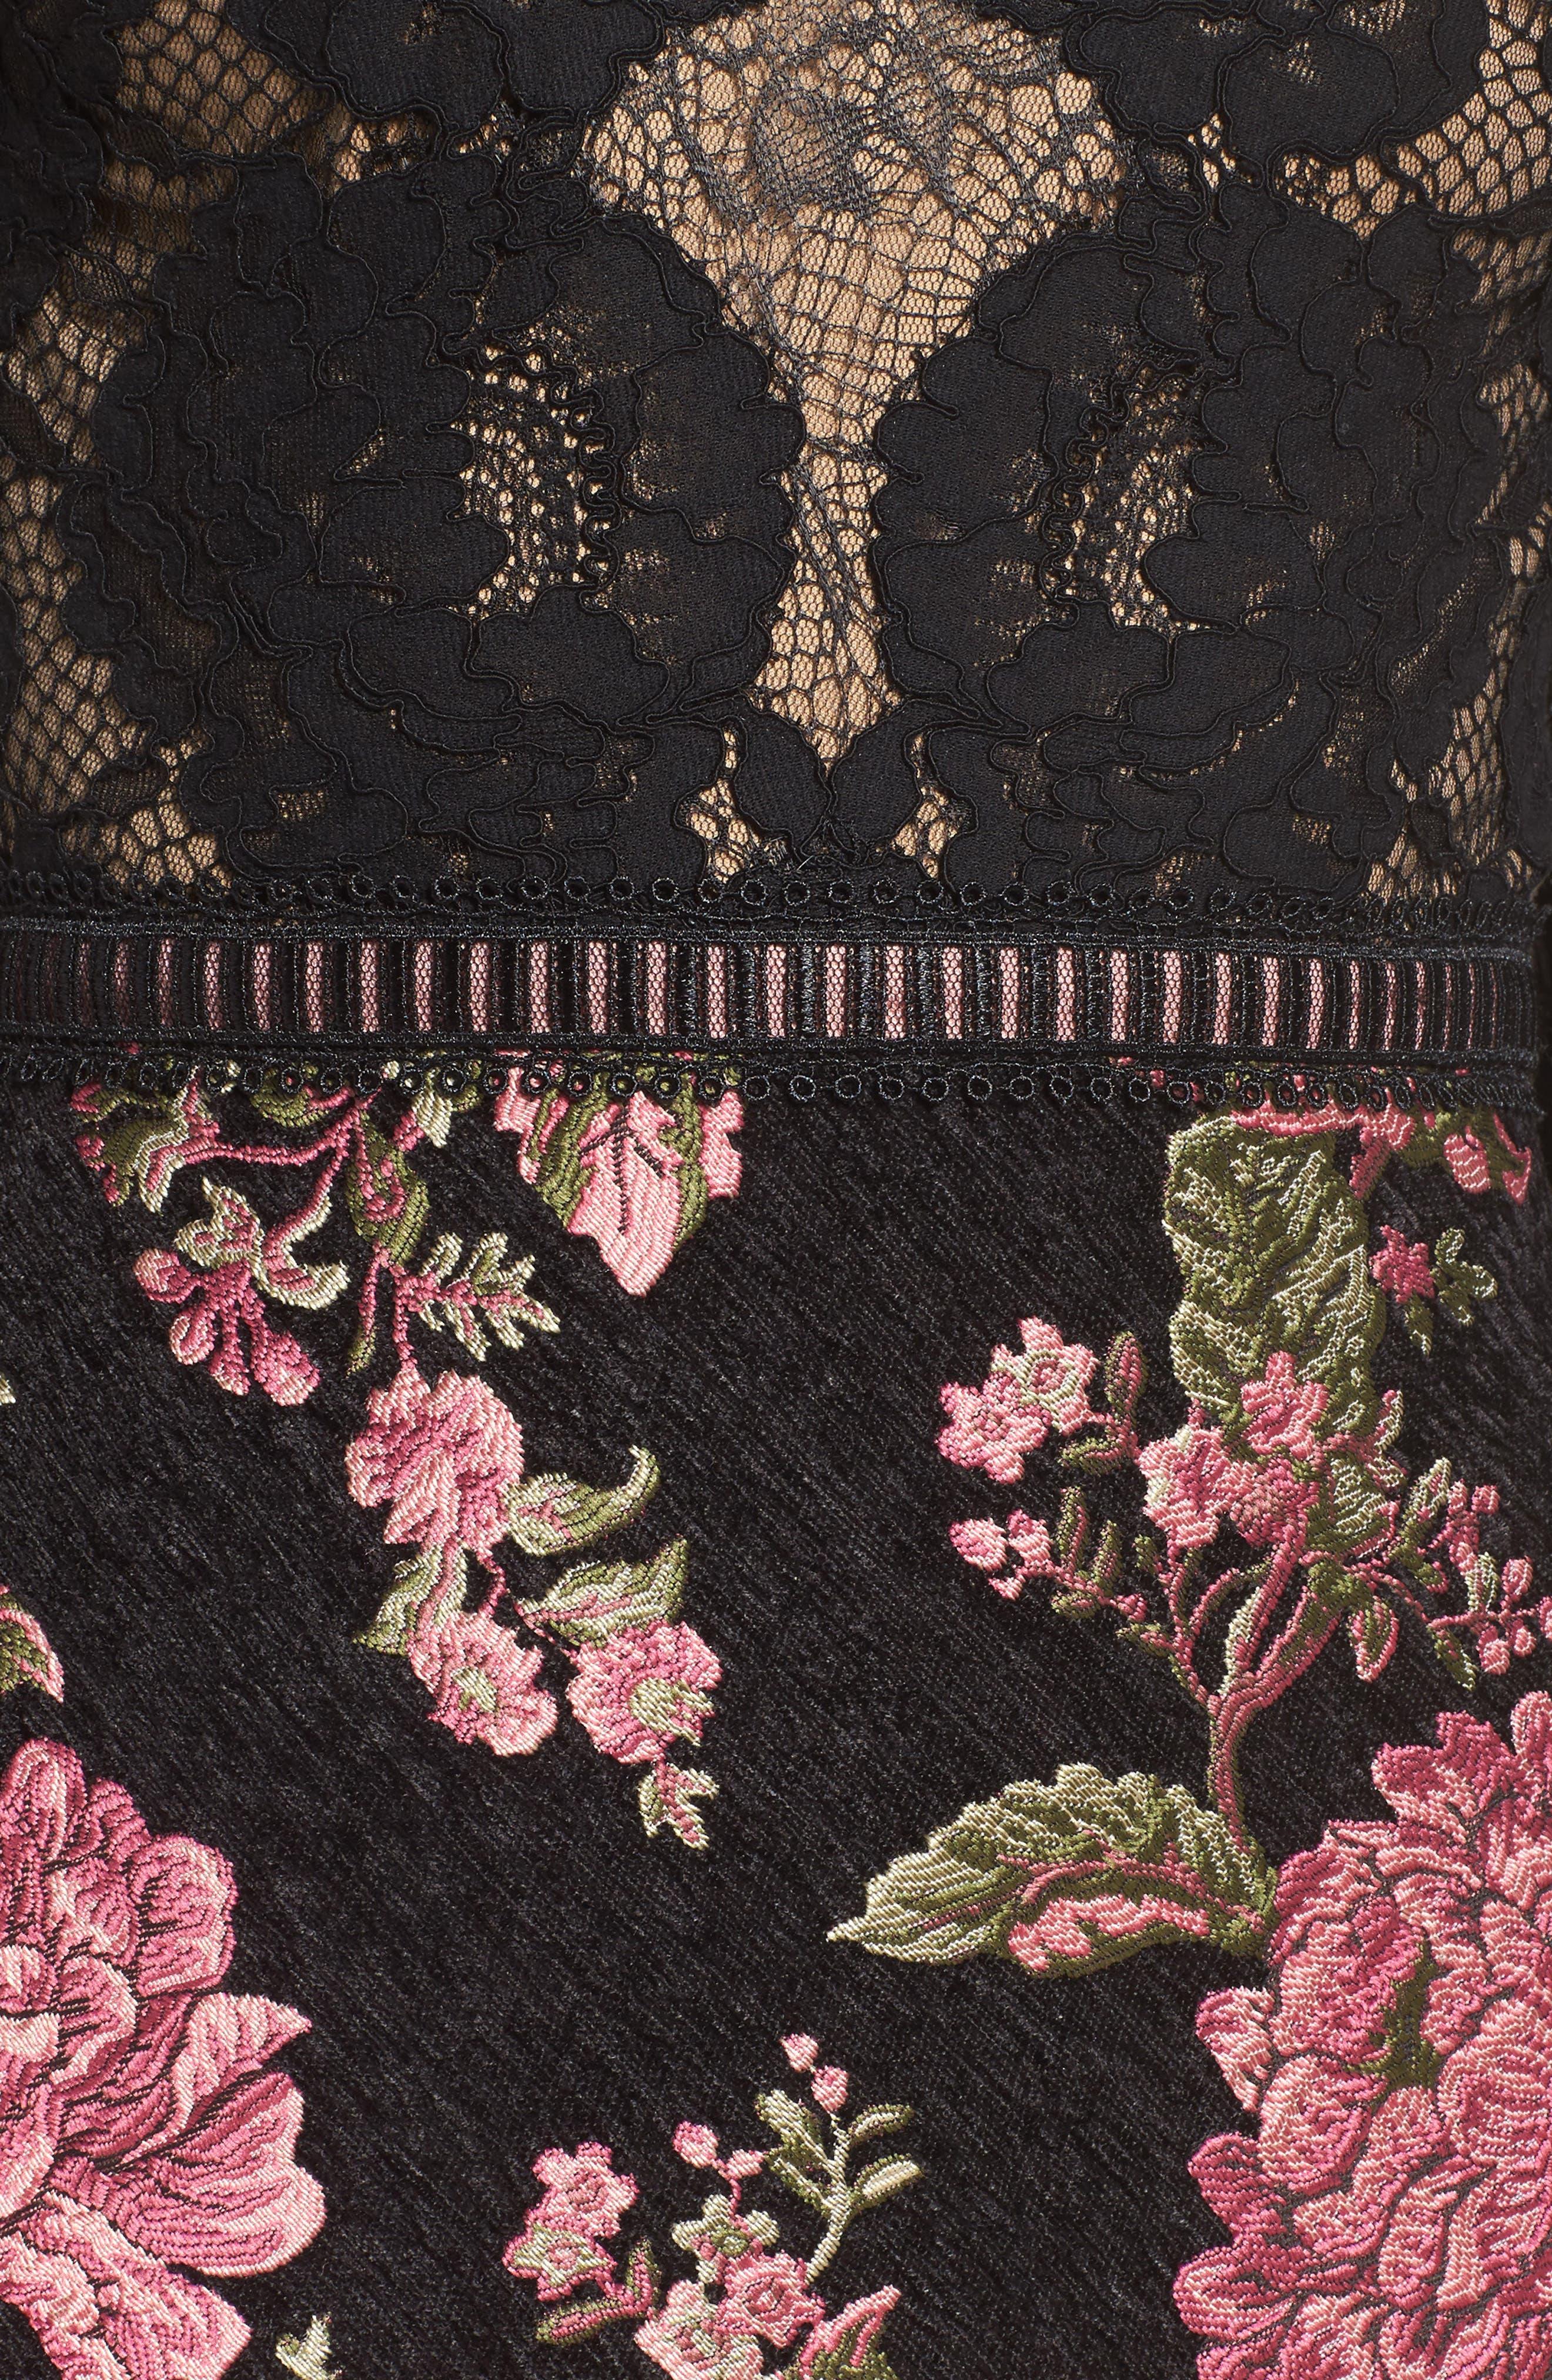 Lace & Brocade Sheath Dress,                             Alternate thumbnail 5, color,